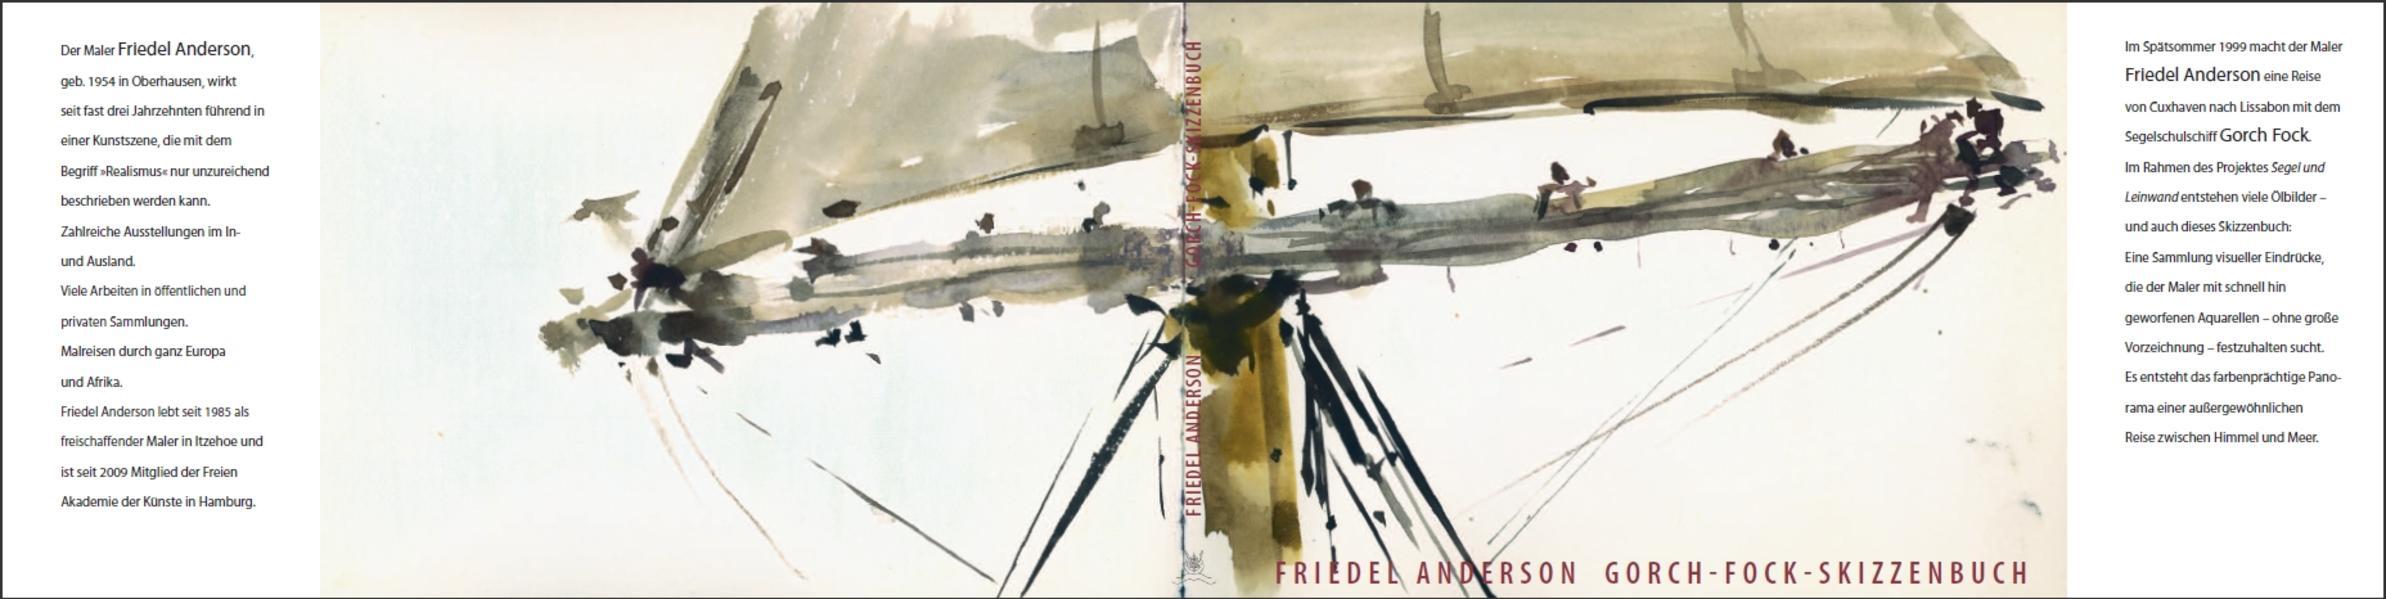 Gorch-Fock-Skizzenbuch - Coverbild